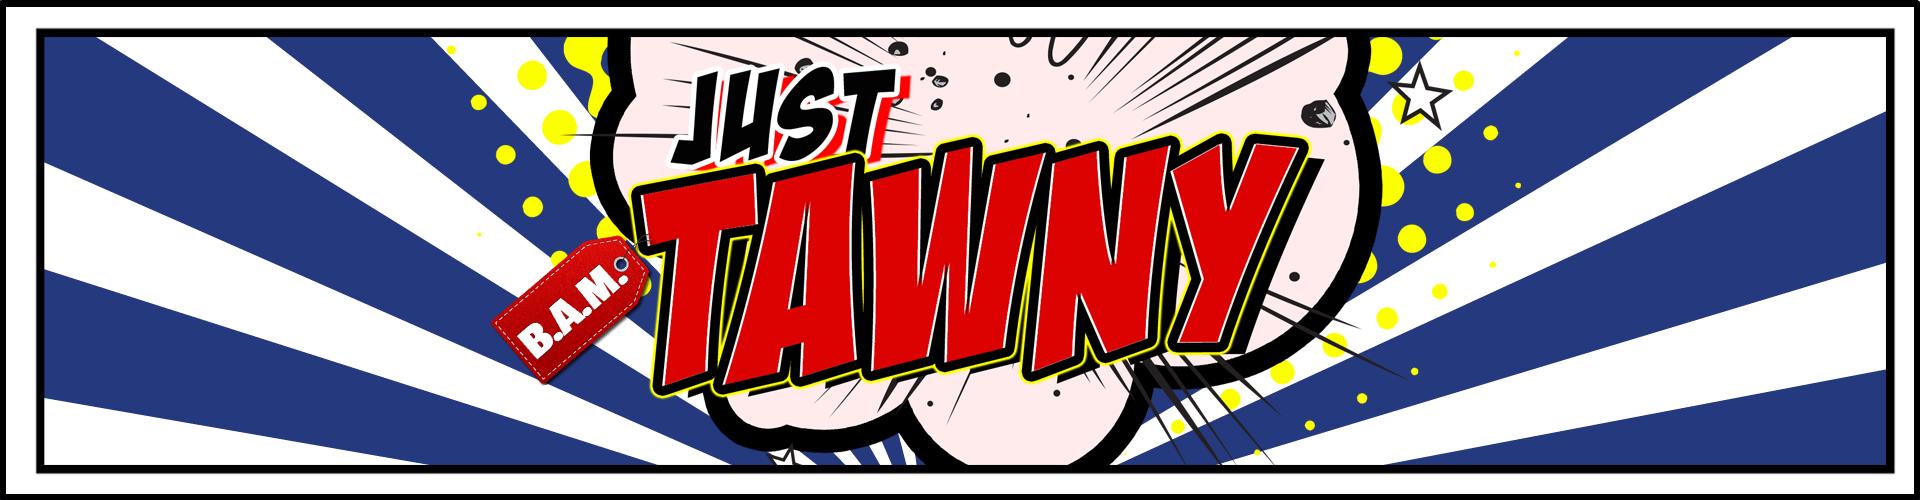 just tawny